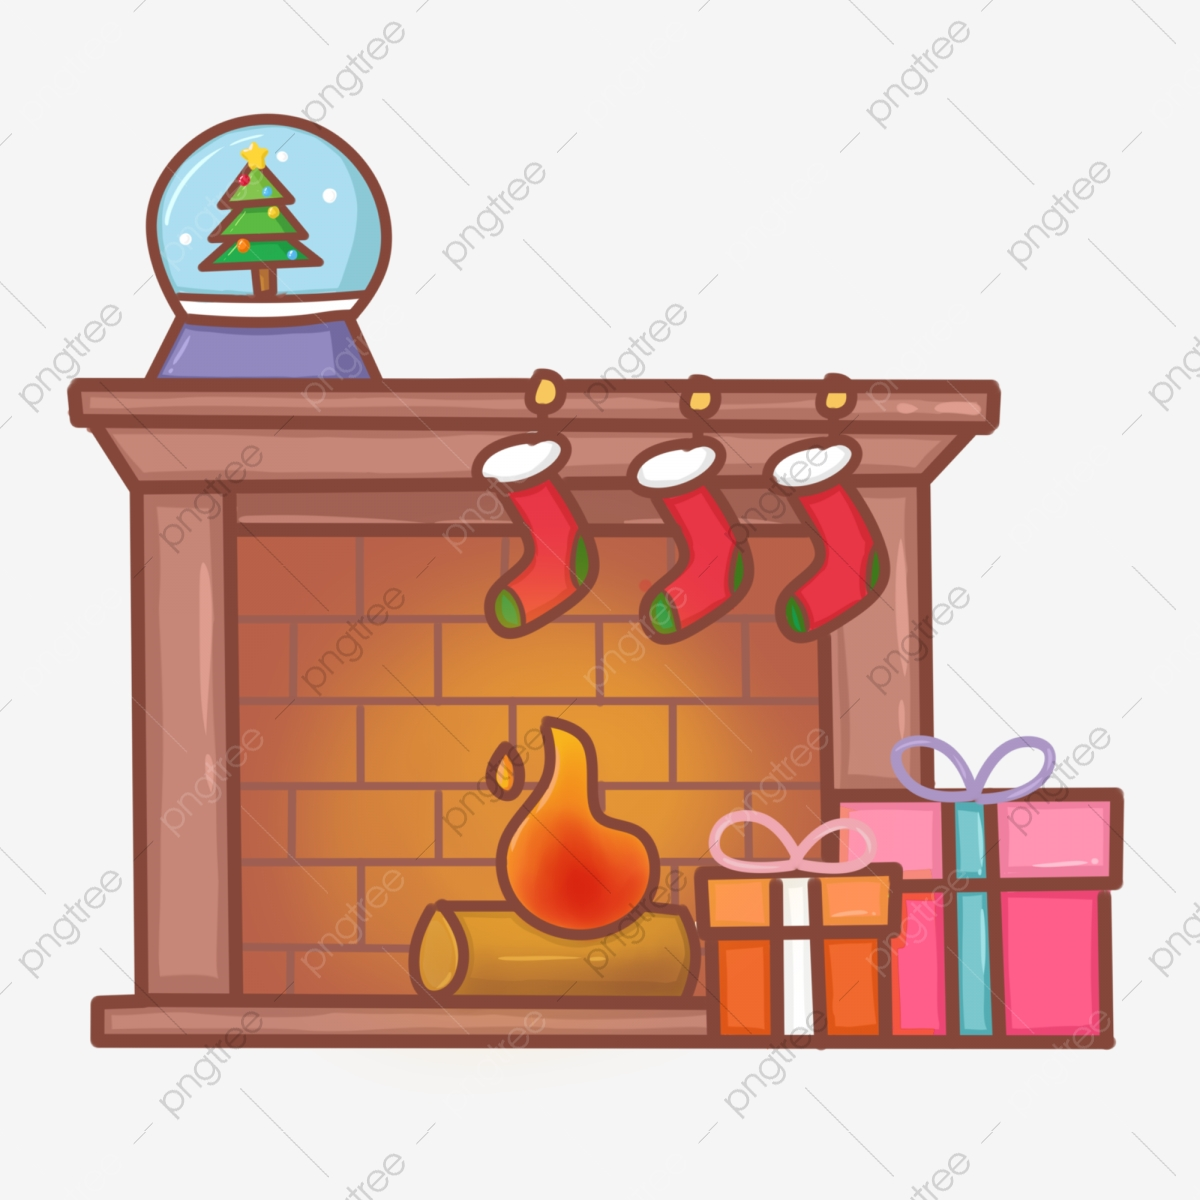 Hand Painted Cartoon Christmas Fireplace Stove, Christmas